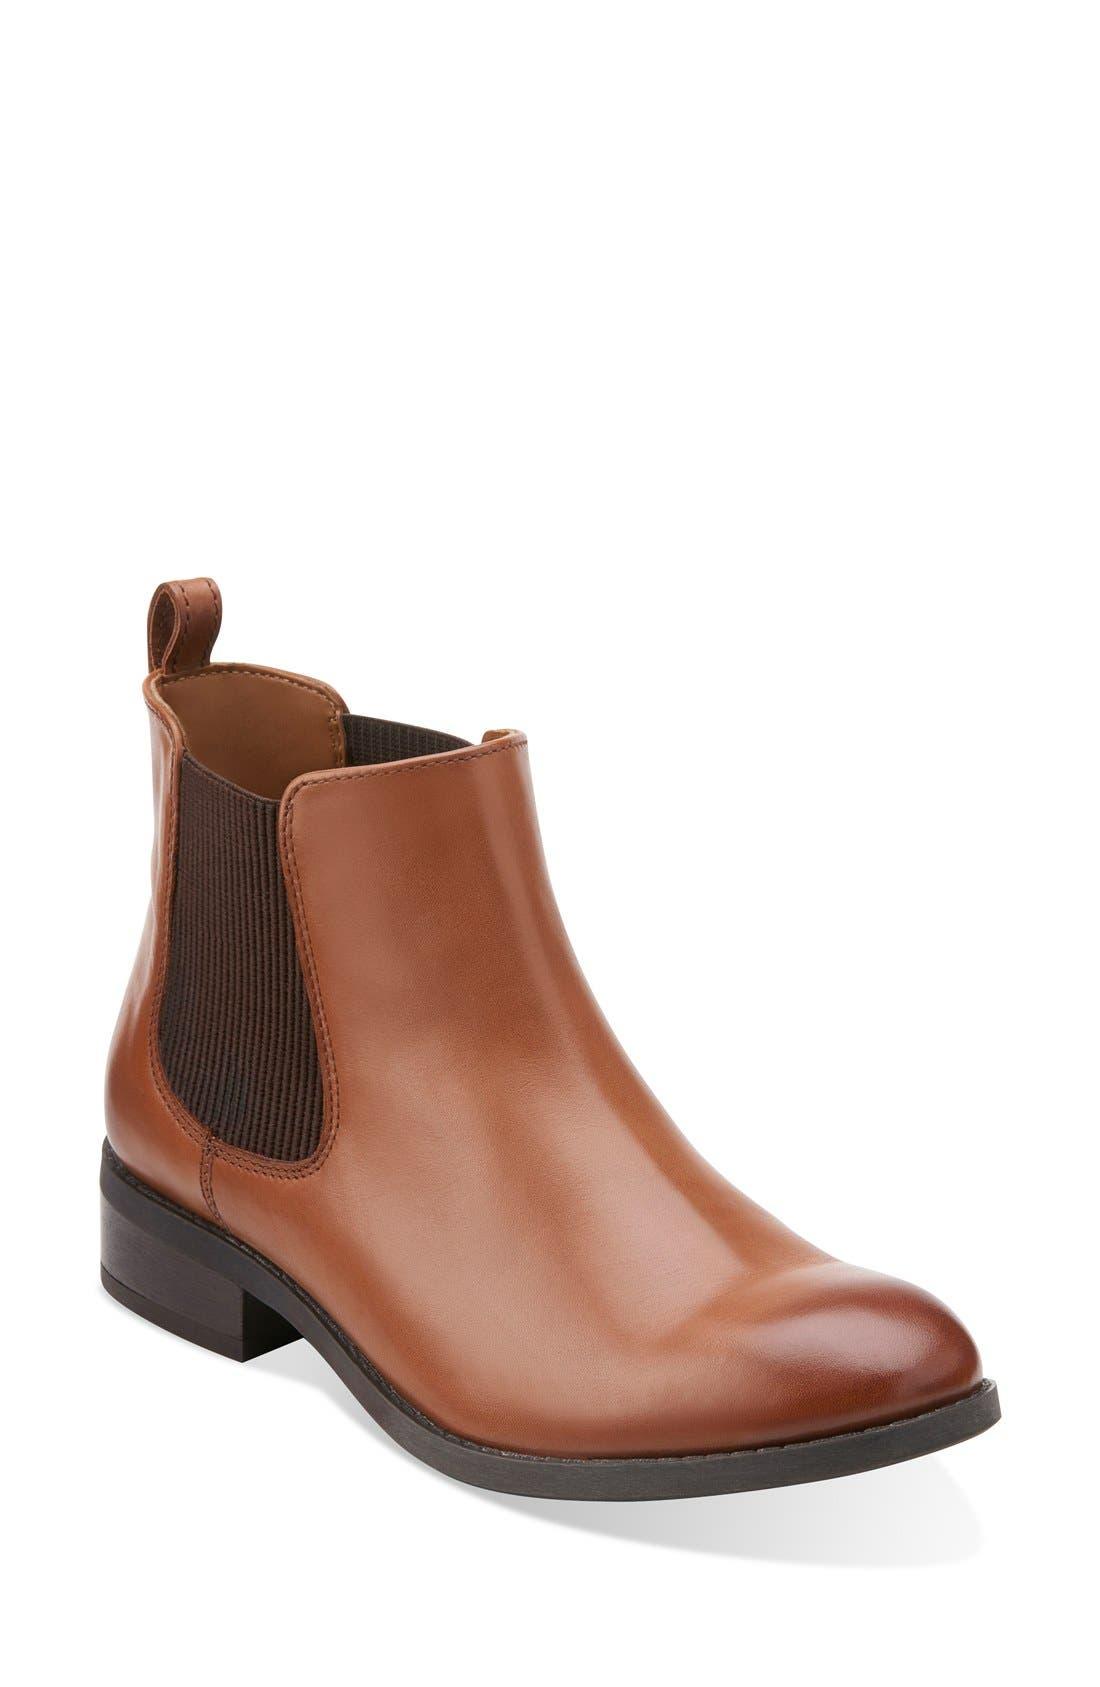 Alternate Image 1 Selected - Clarks® 'Pita Sedona' Chelsea Boot (Women)